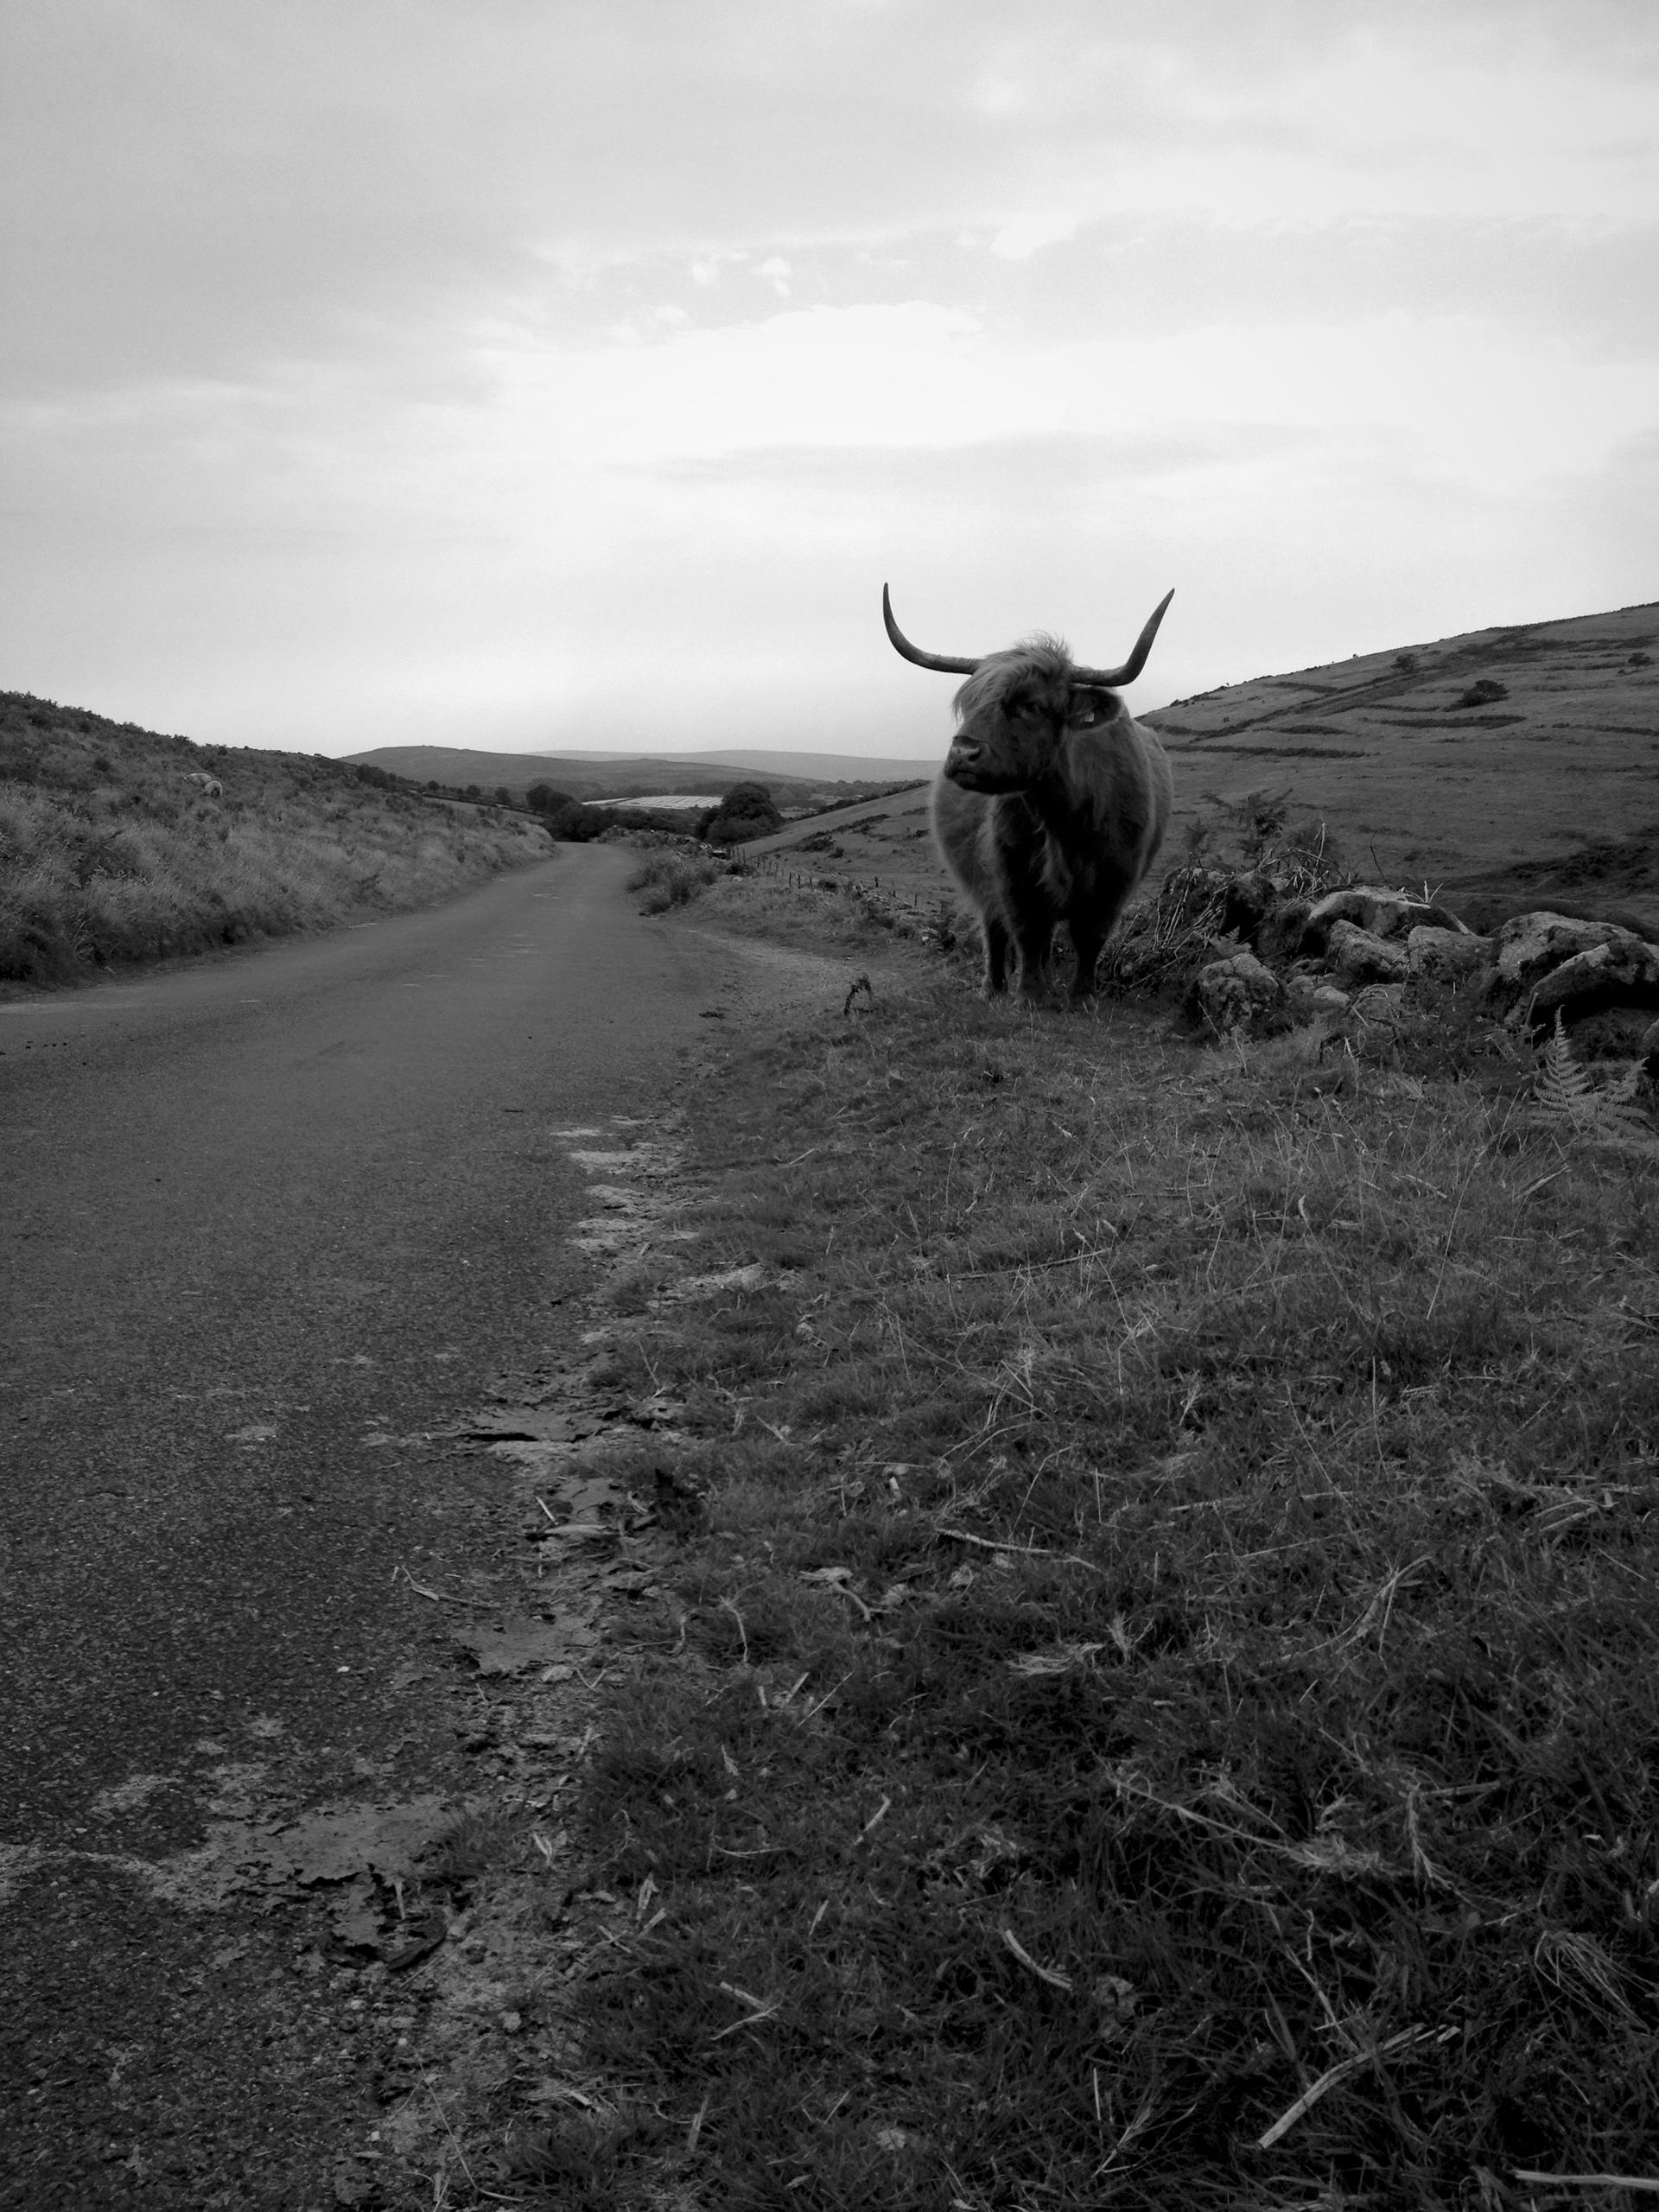 Land met pixies, headless horse - nesbitandgibley | ello